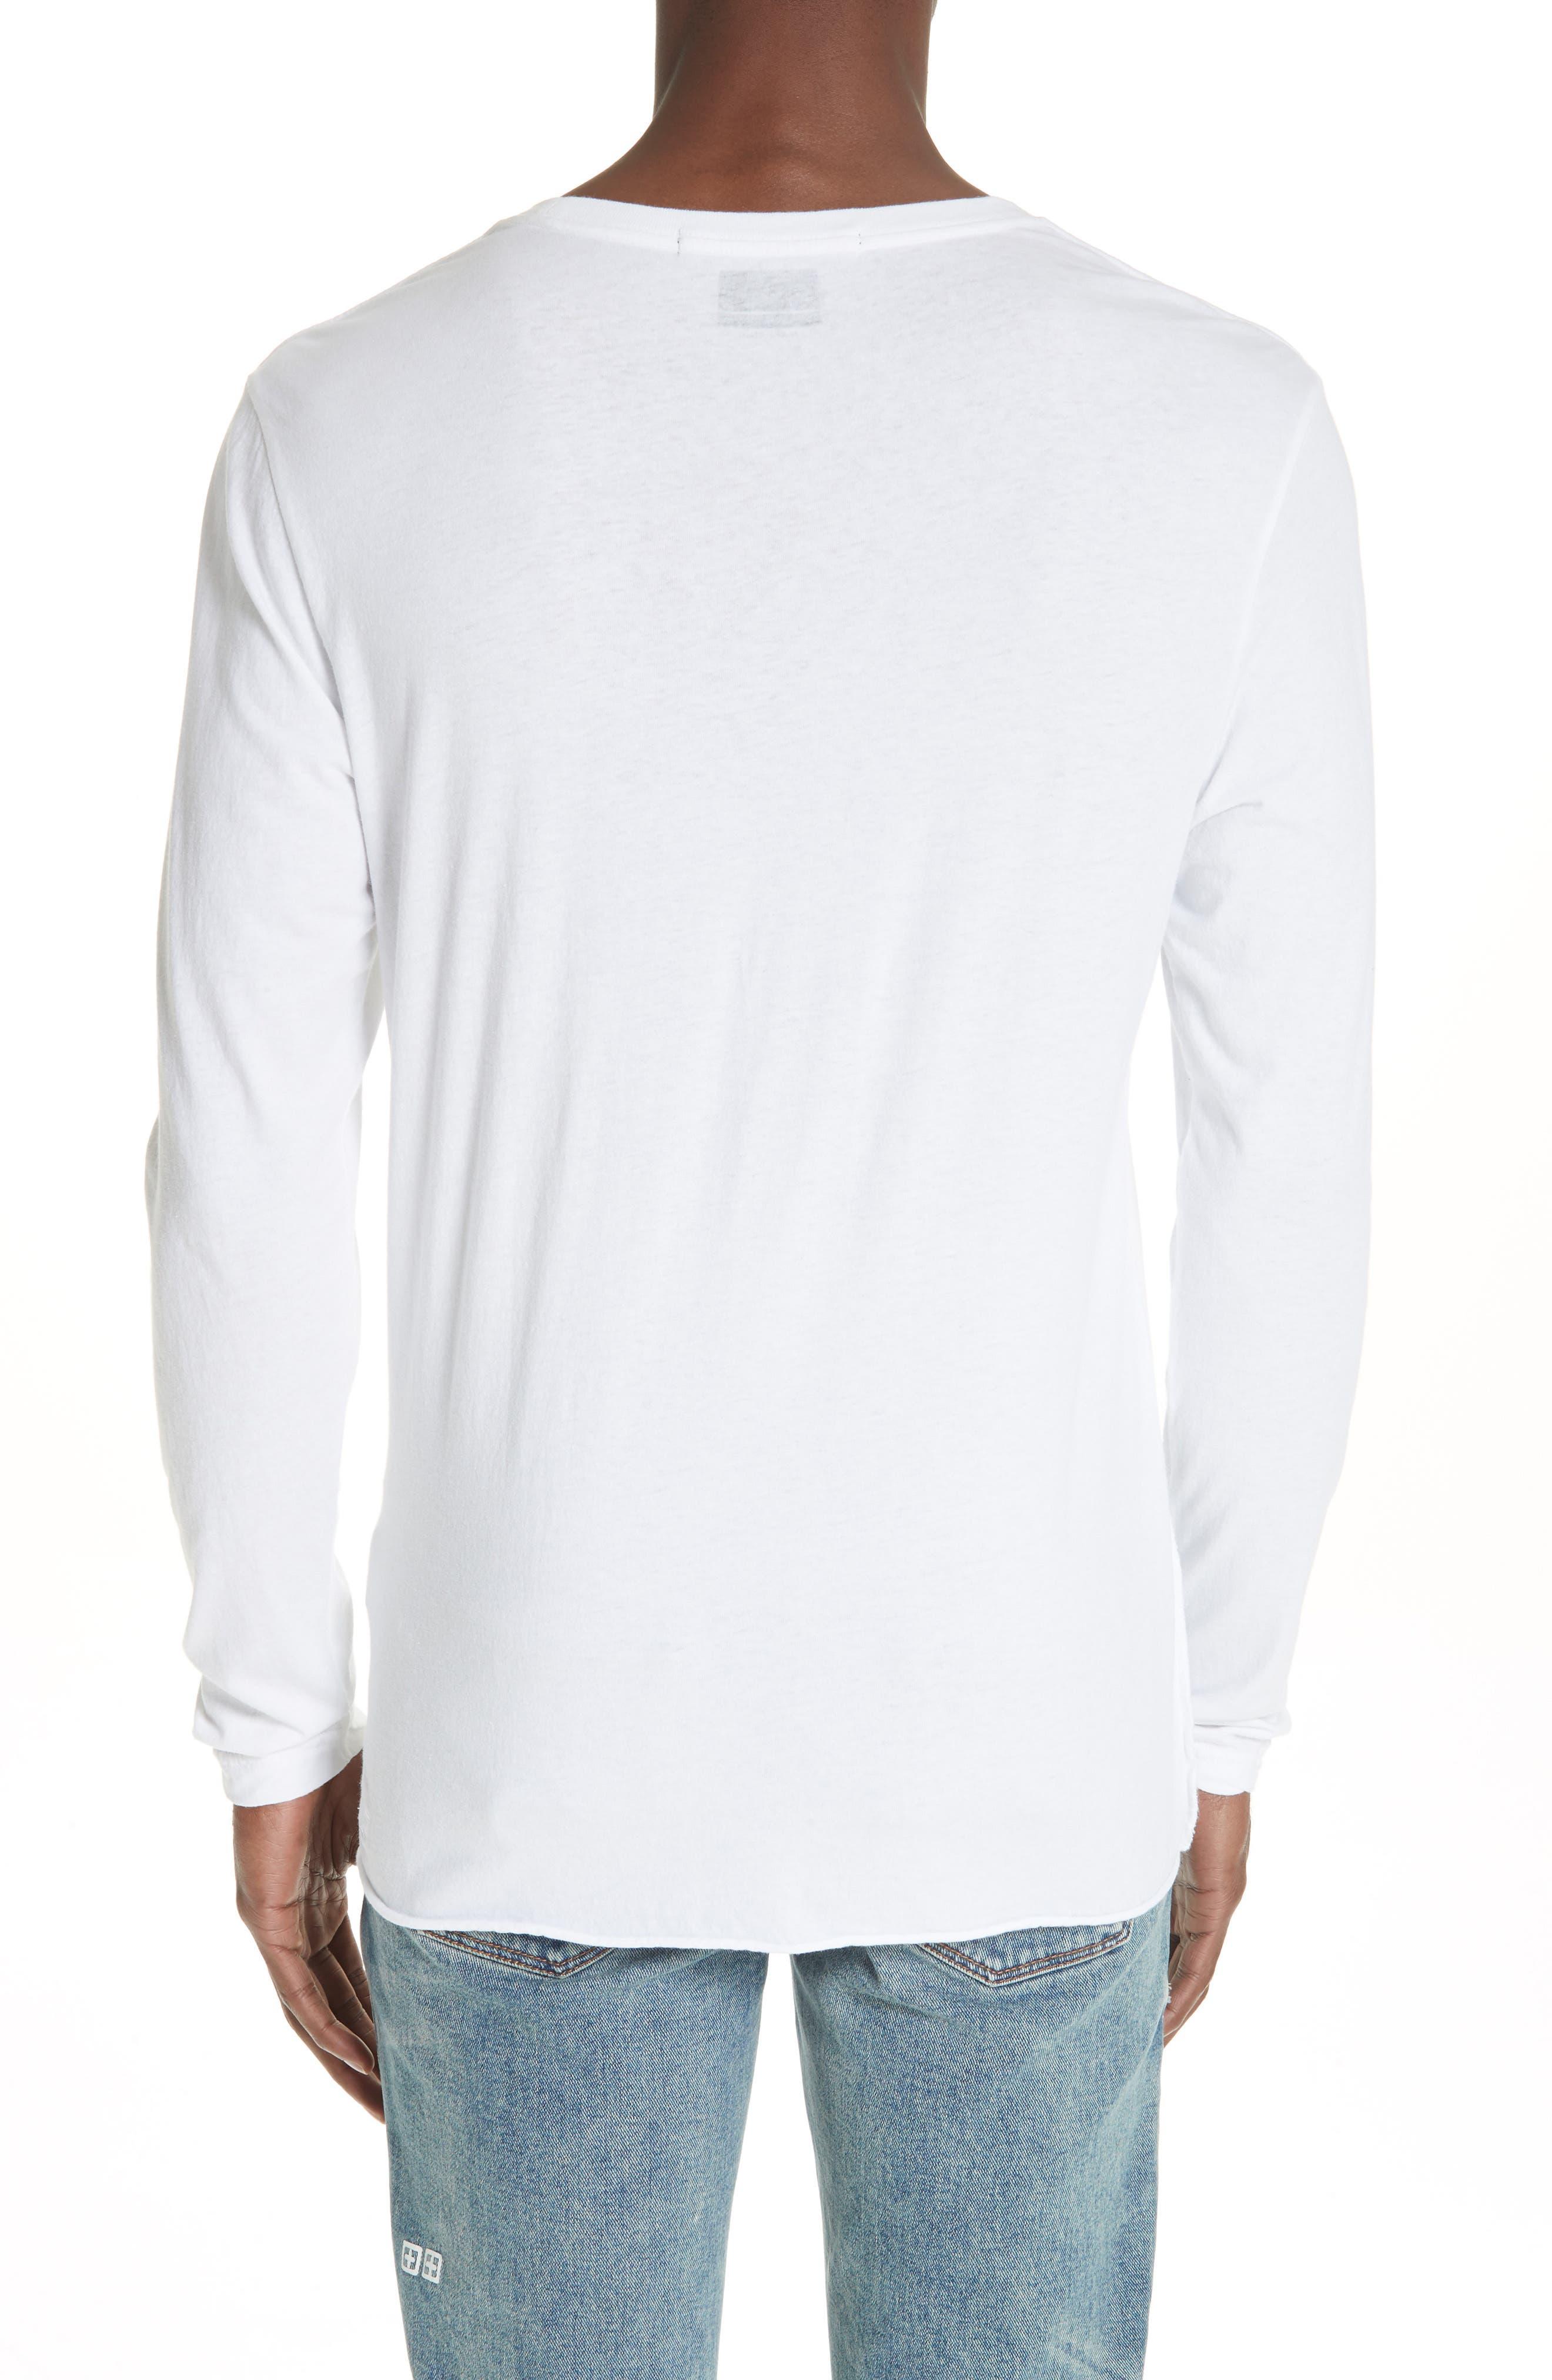 No Bomb Graphic Long Sleeve T-Shirt,                             Alternate thumbnail 2, color,                             WHITE